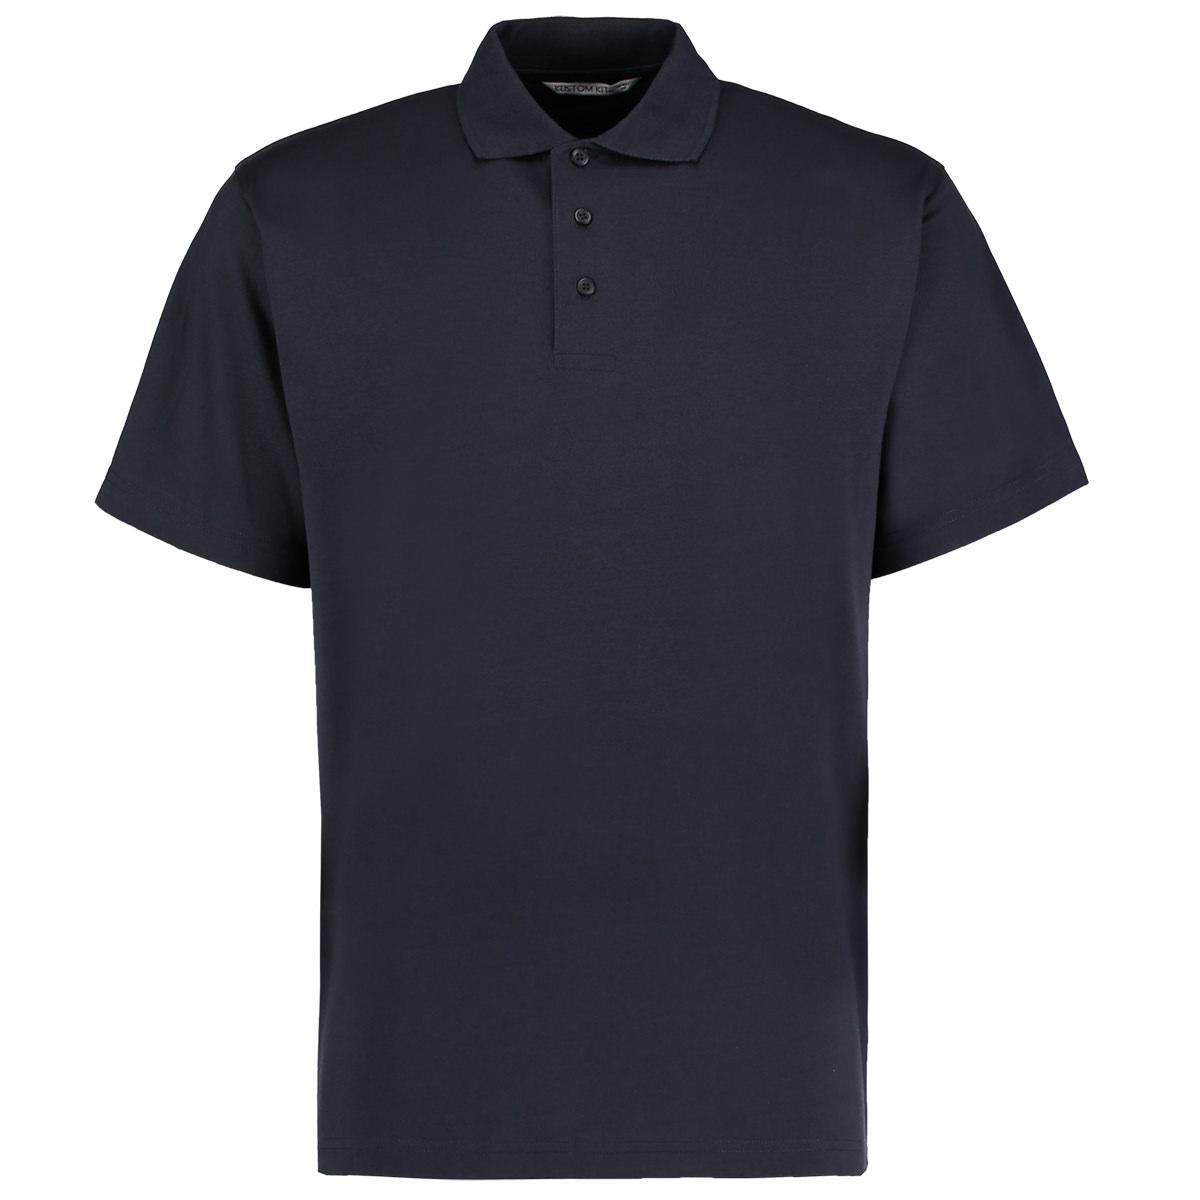 Kk402 Jersey Knit Polo Kustom Kit